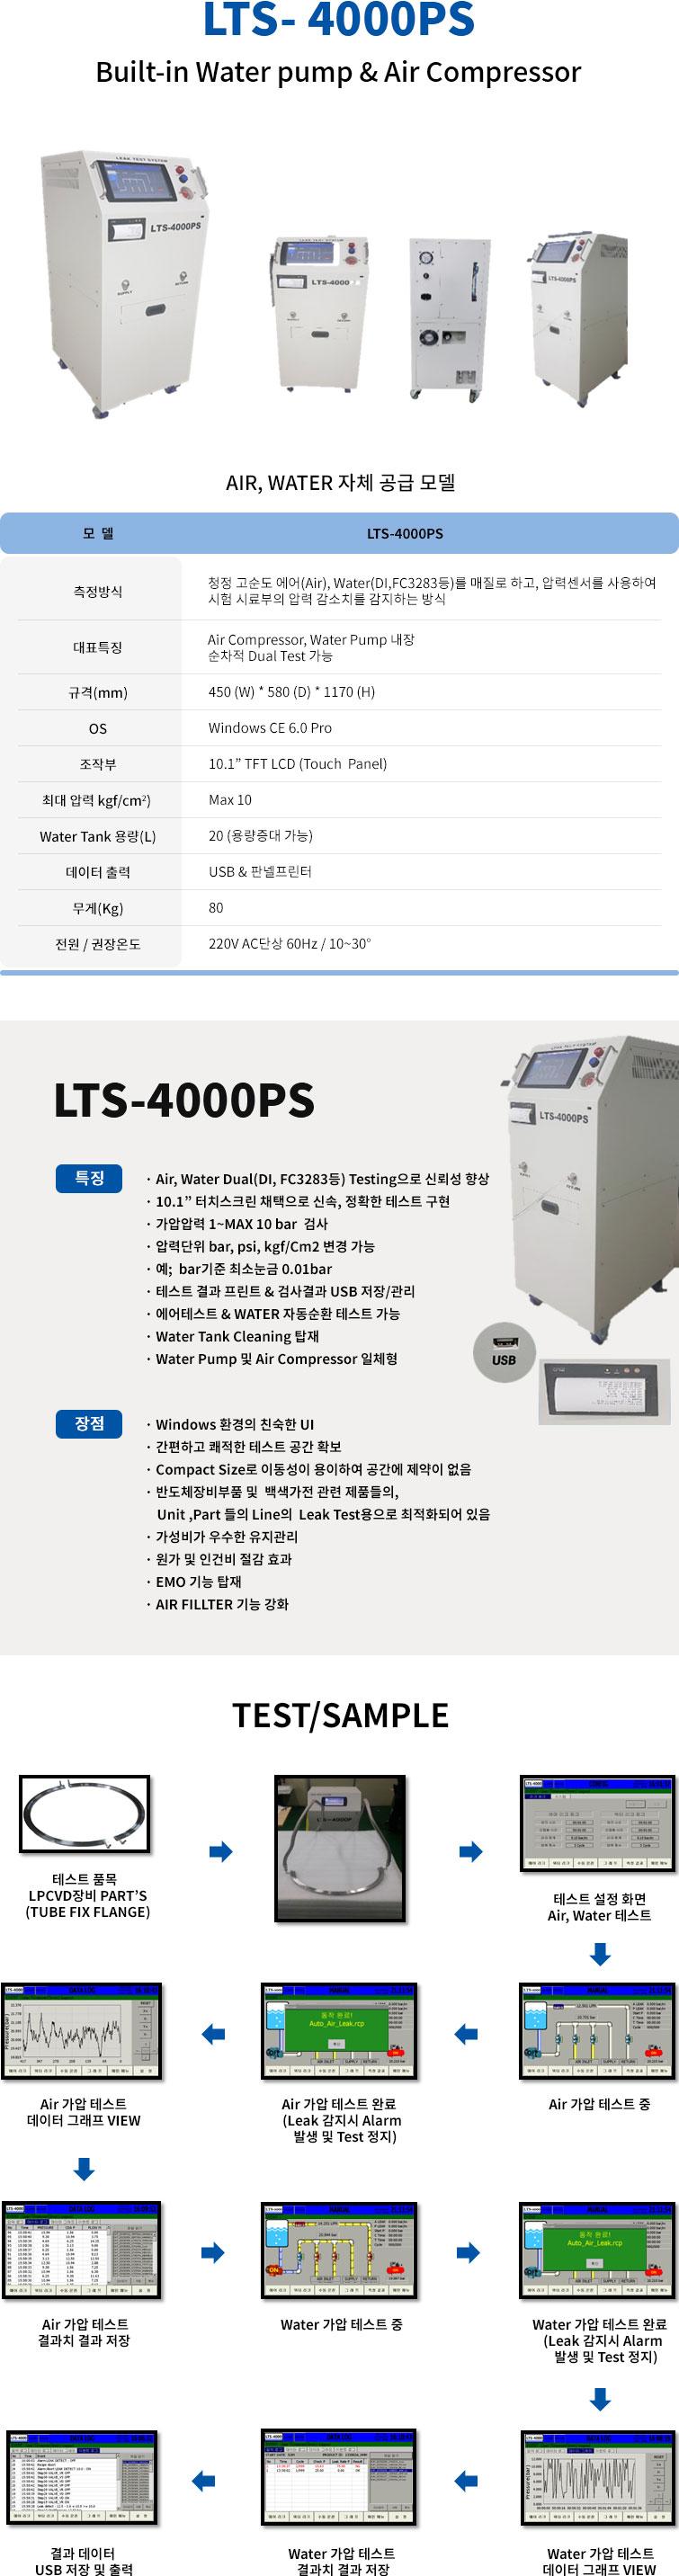 LTS-4000ps.jpg